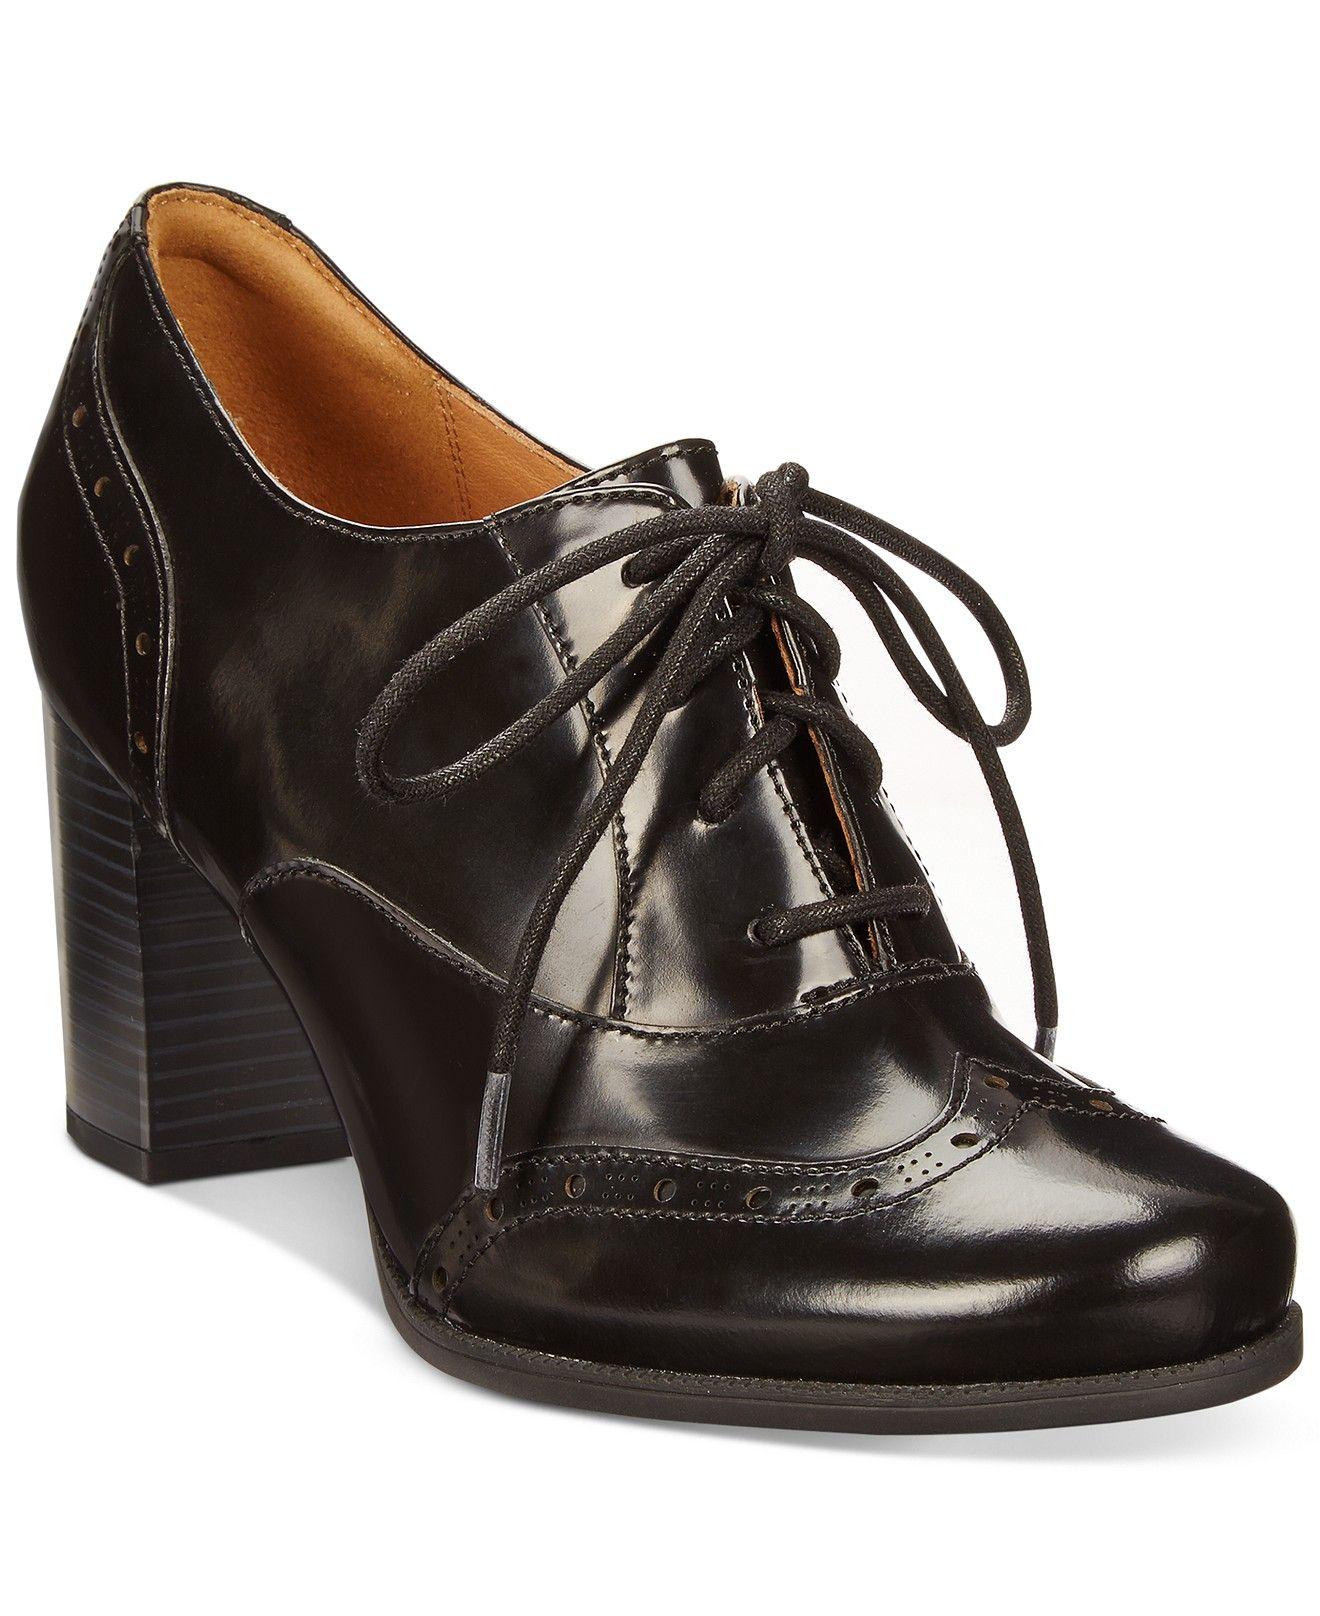 Clarks Artisan Women's Ciera Brine Oxford Shooties Boots